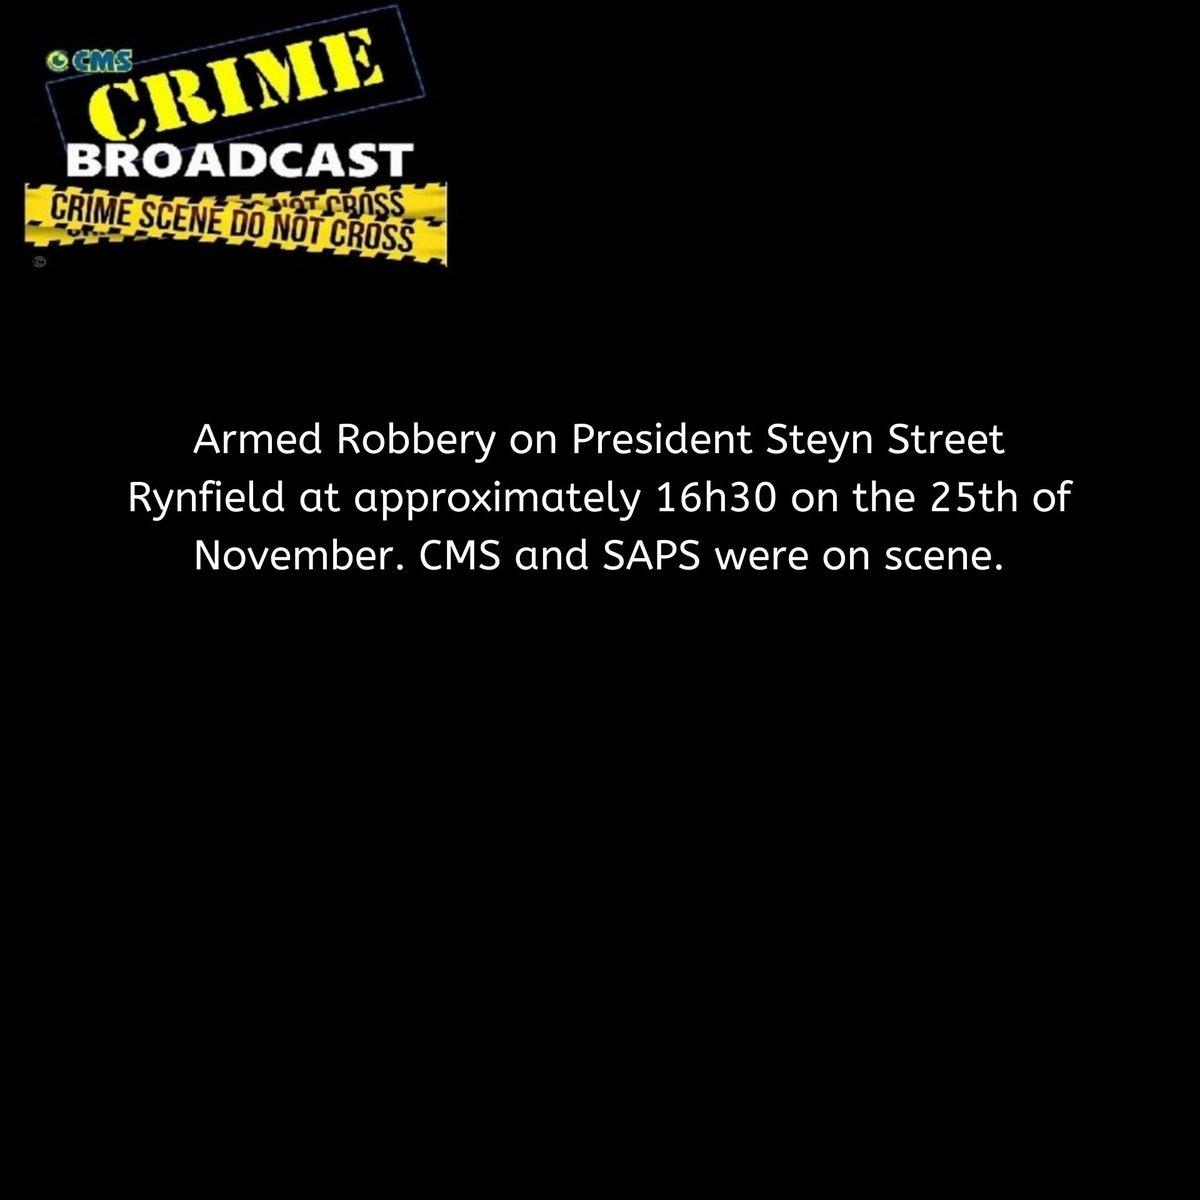 Crimebroadcast 2020-11-26 #CommunityRules #Safety  #proudlycms #Patrolling #Precincts #Ekurhuleni #Reaction #Closures #CommunityMonitoringServices https://t.co/AyJKybyu5K